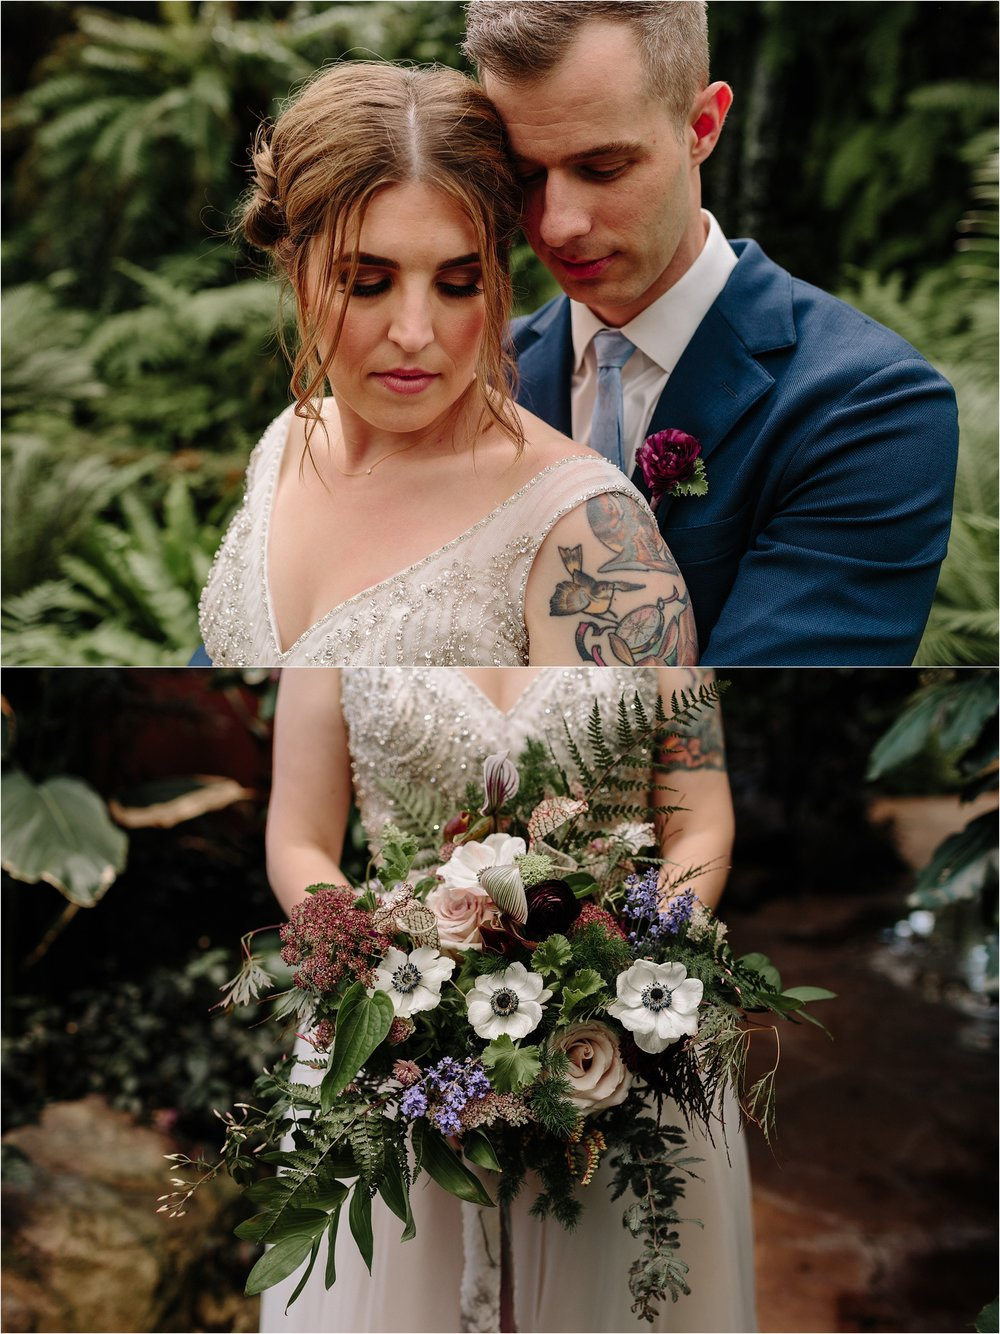 garfield-park-conservatory-wedding-127.jpg